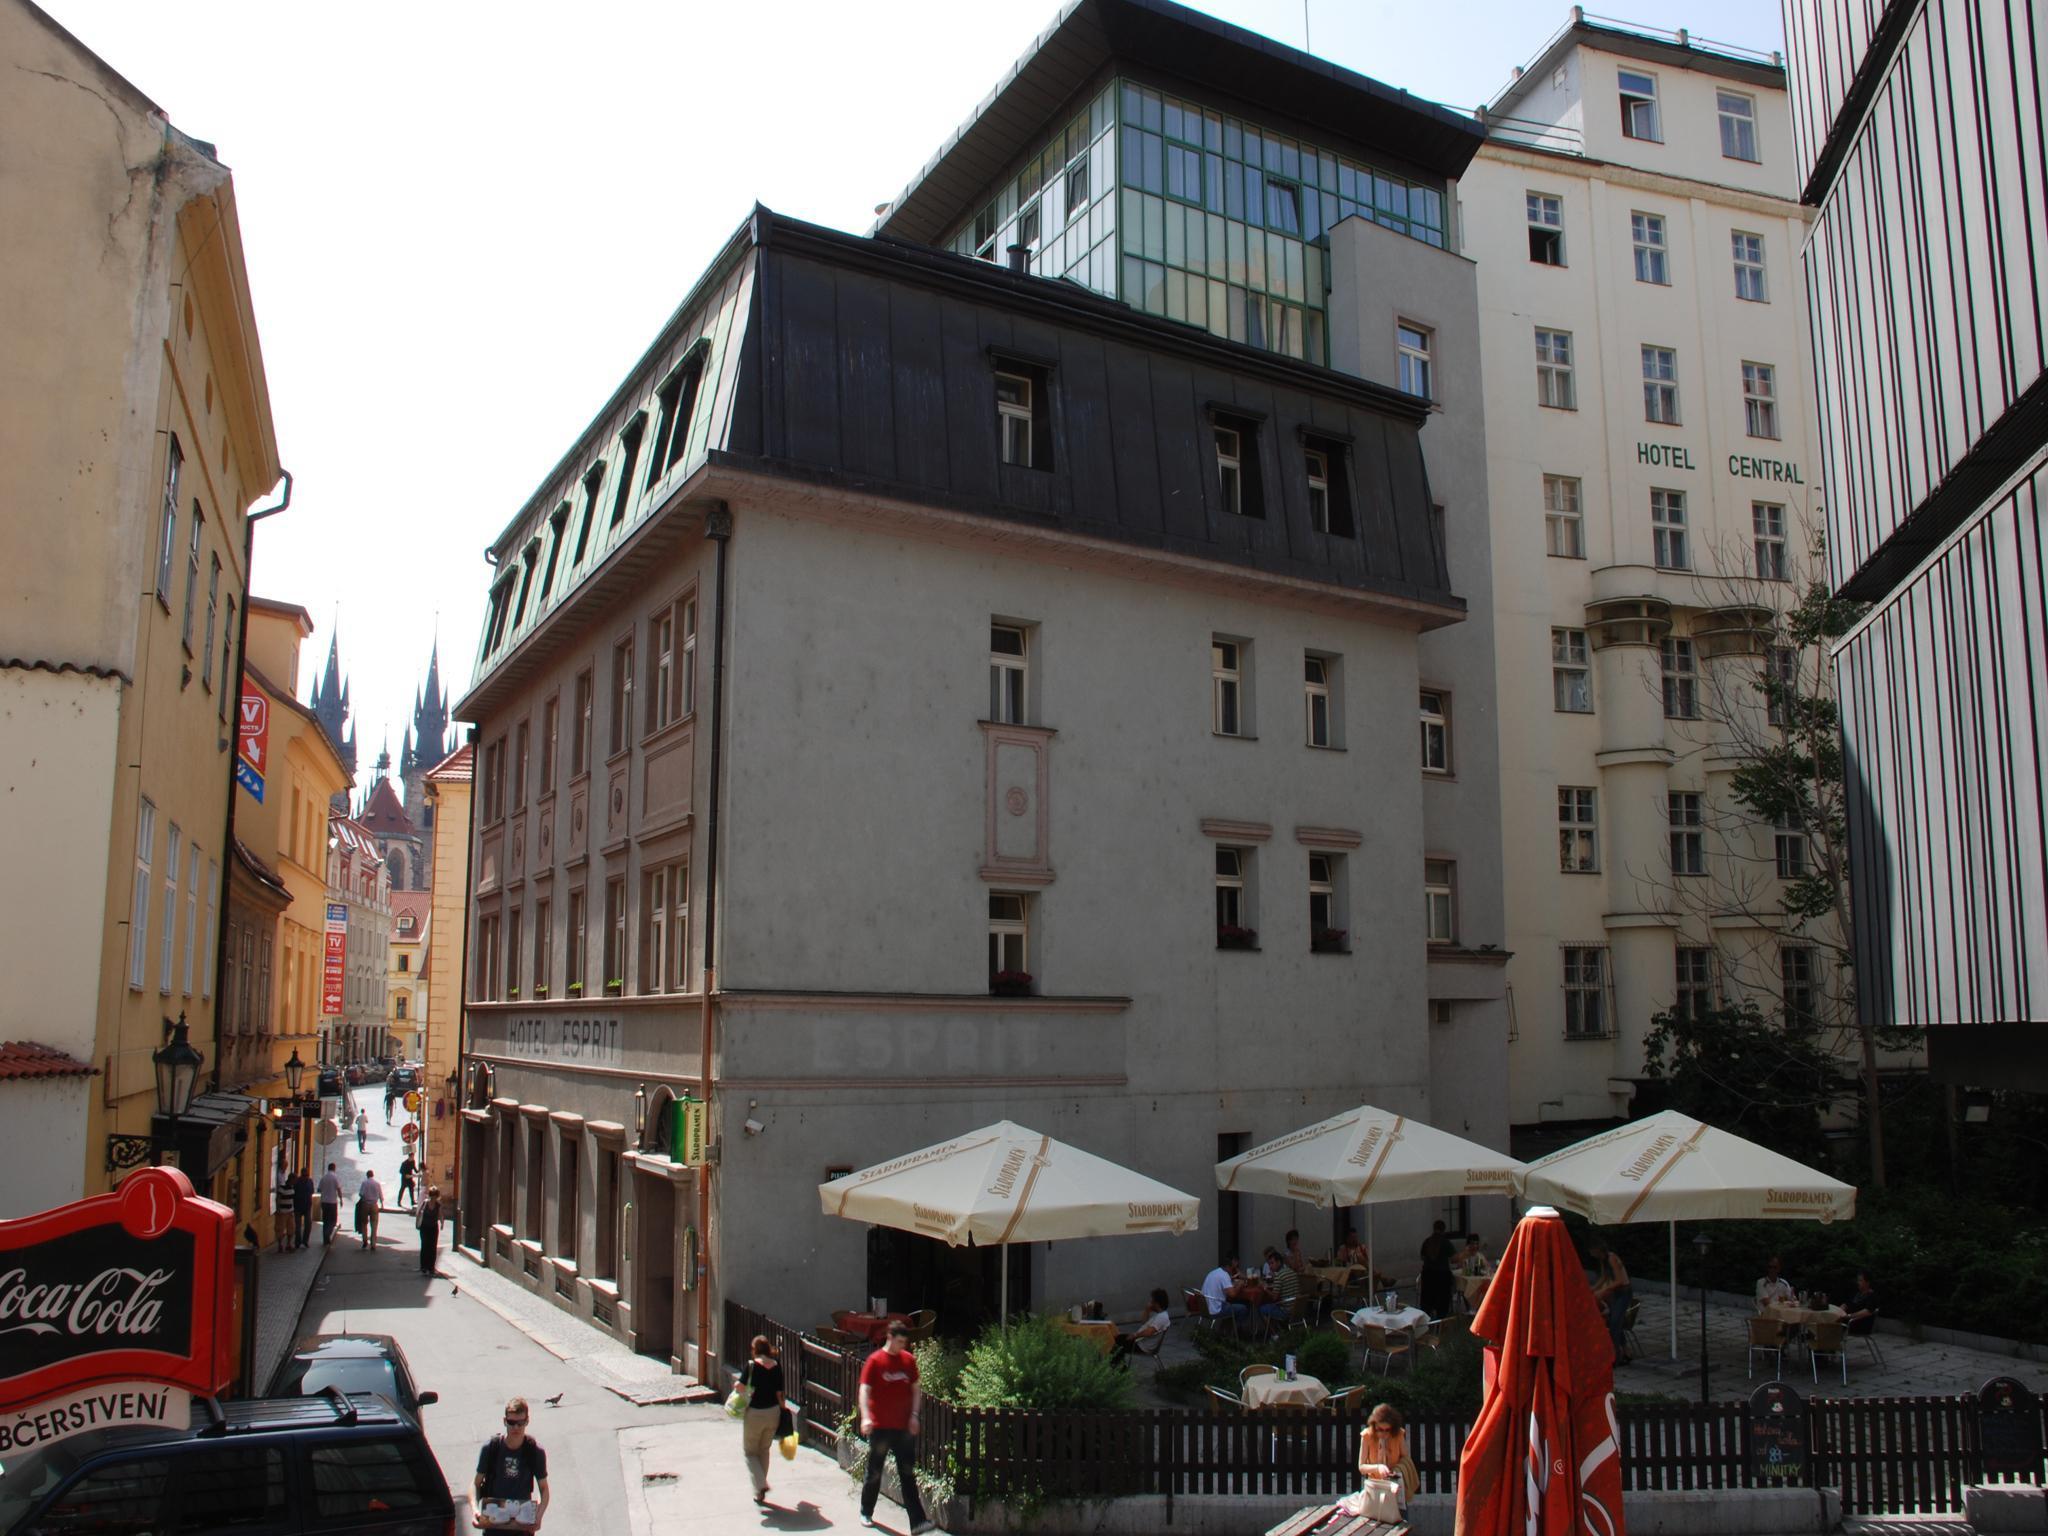 Vasca Da Bagno Esprit : Ea hotel royal esprit praga affari imbattibili su agoda